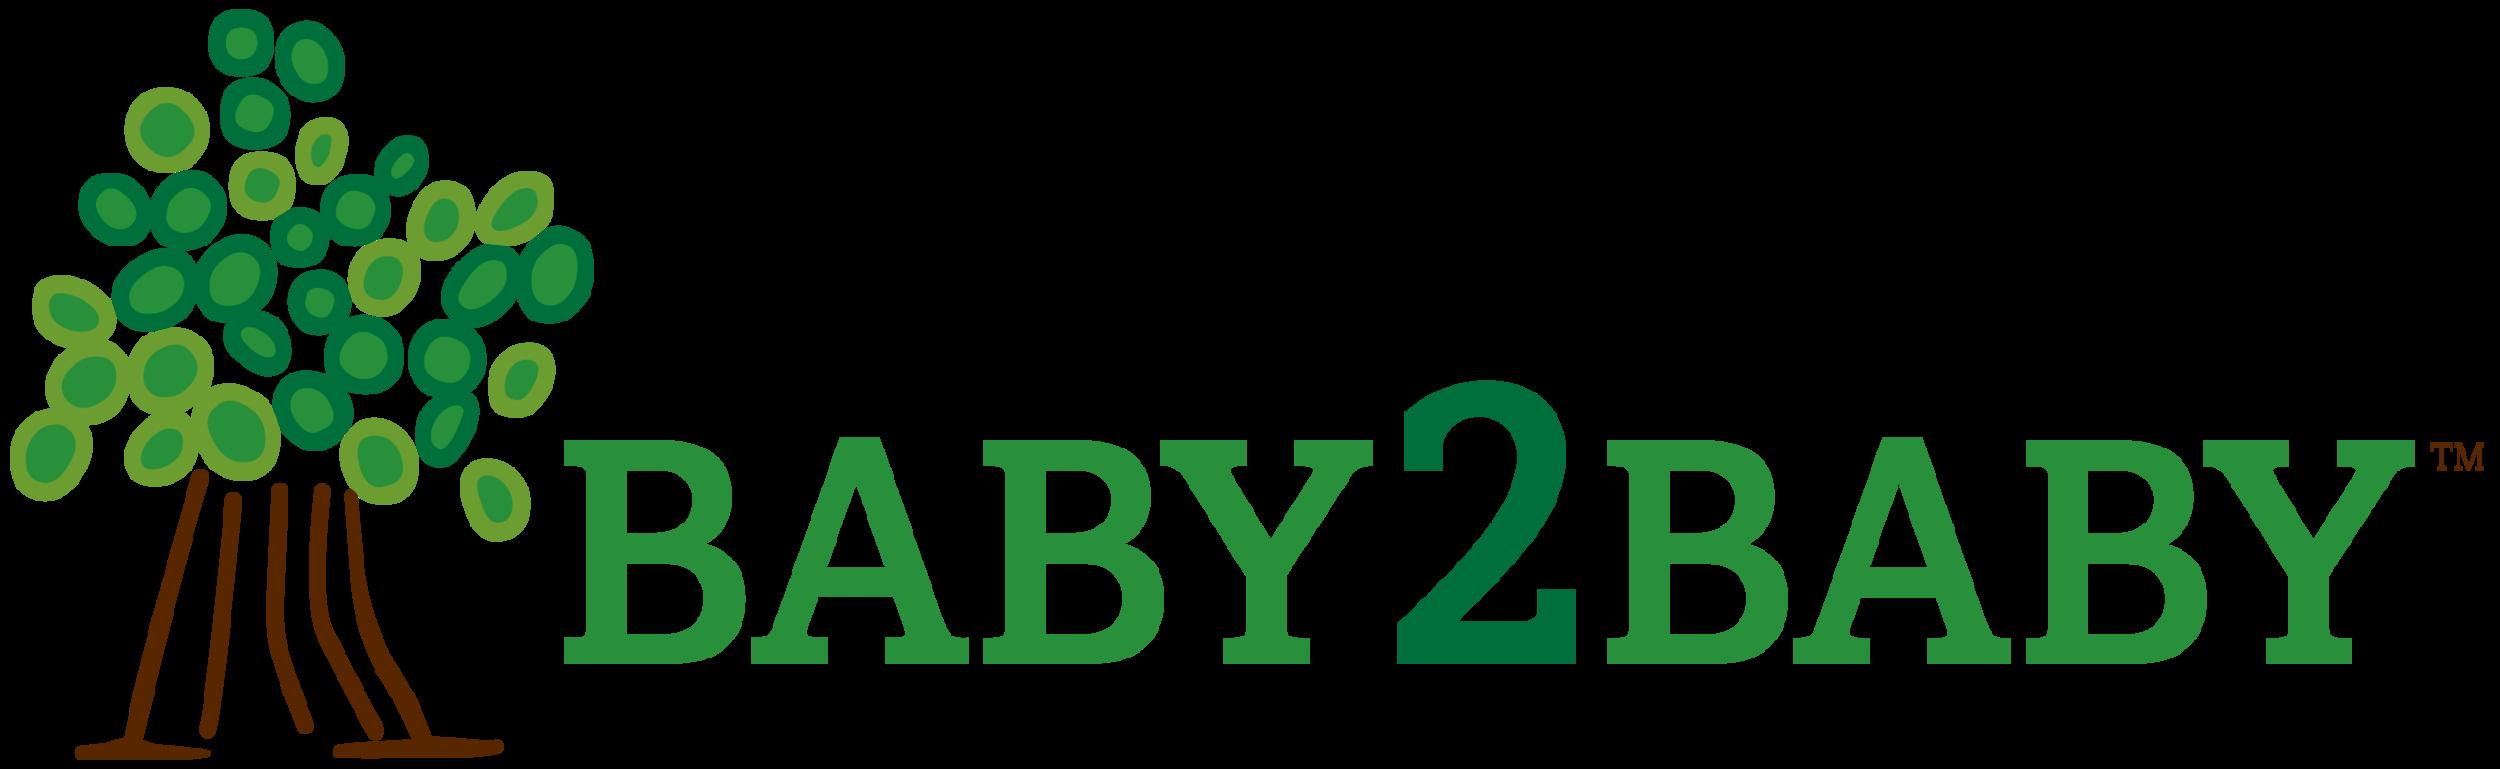 Baby2Baby_Logo.jpg